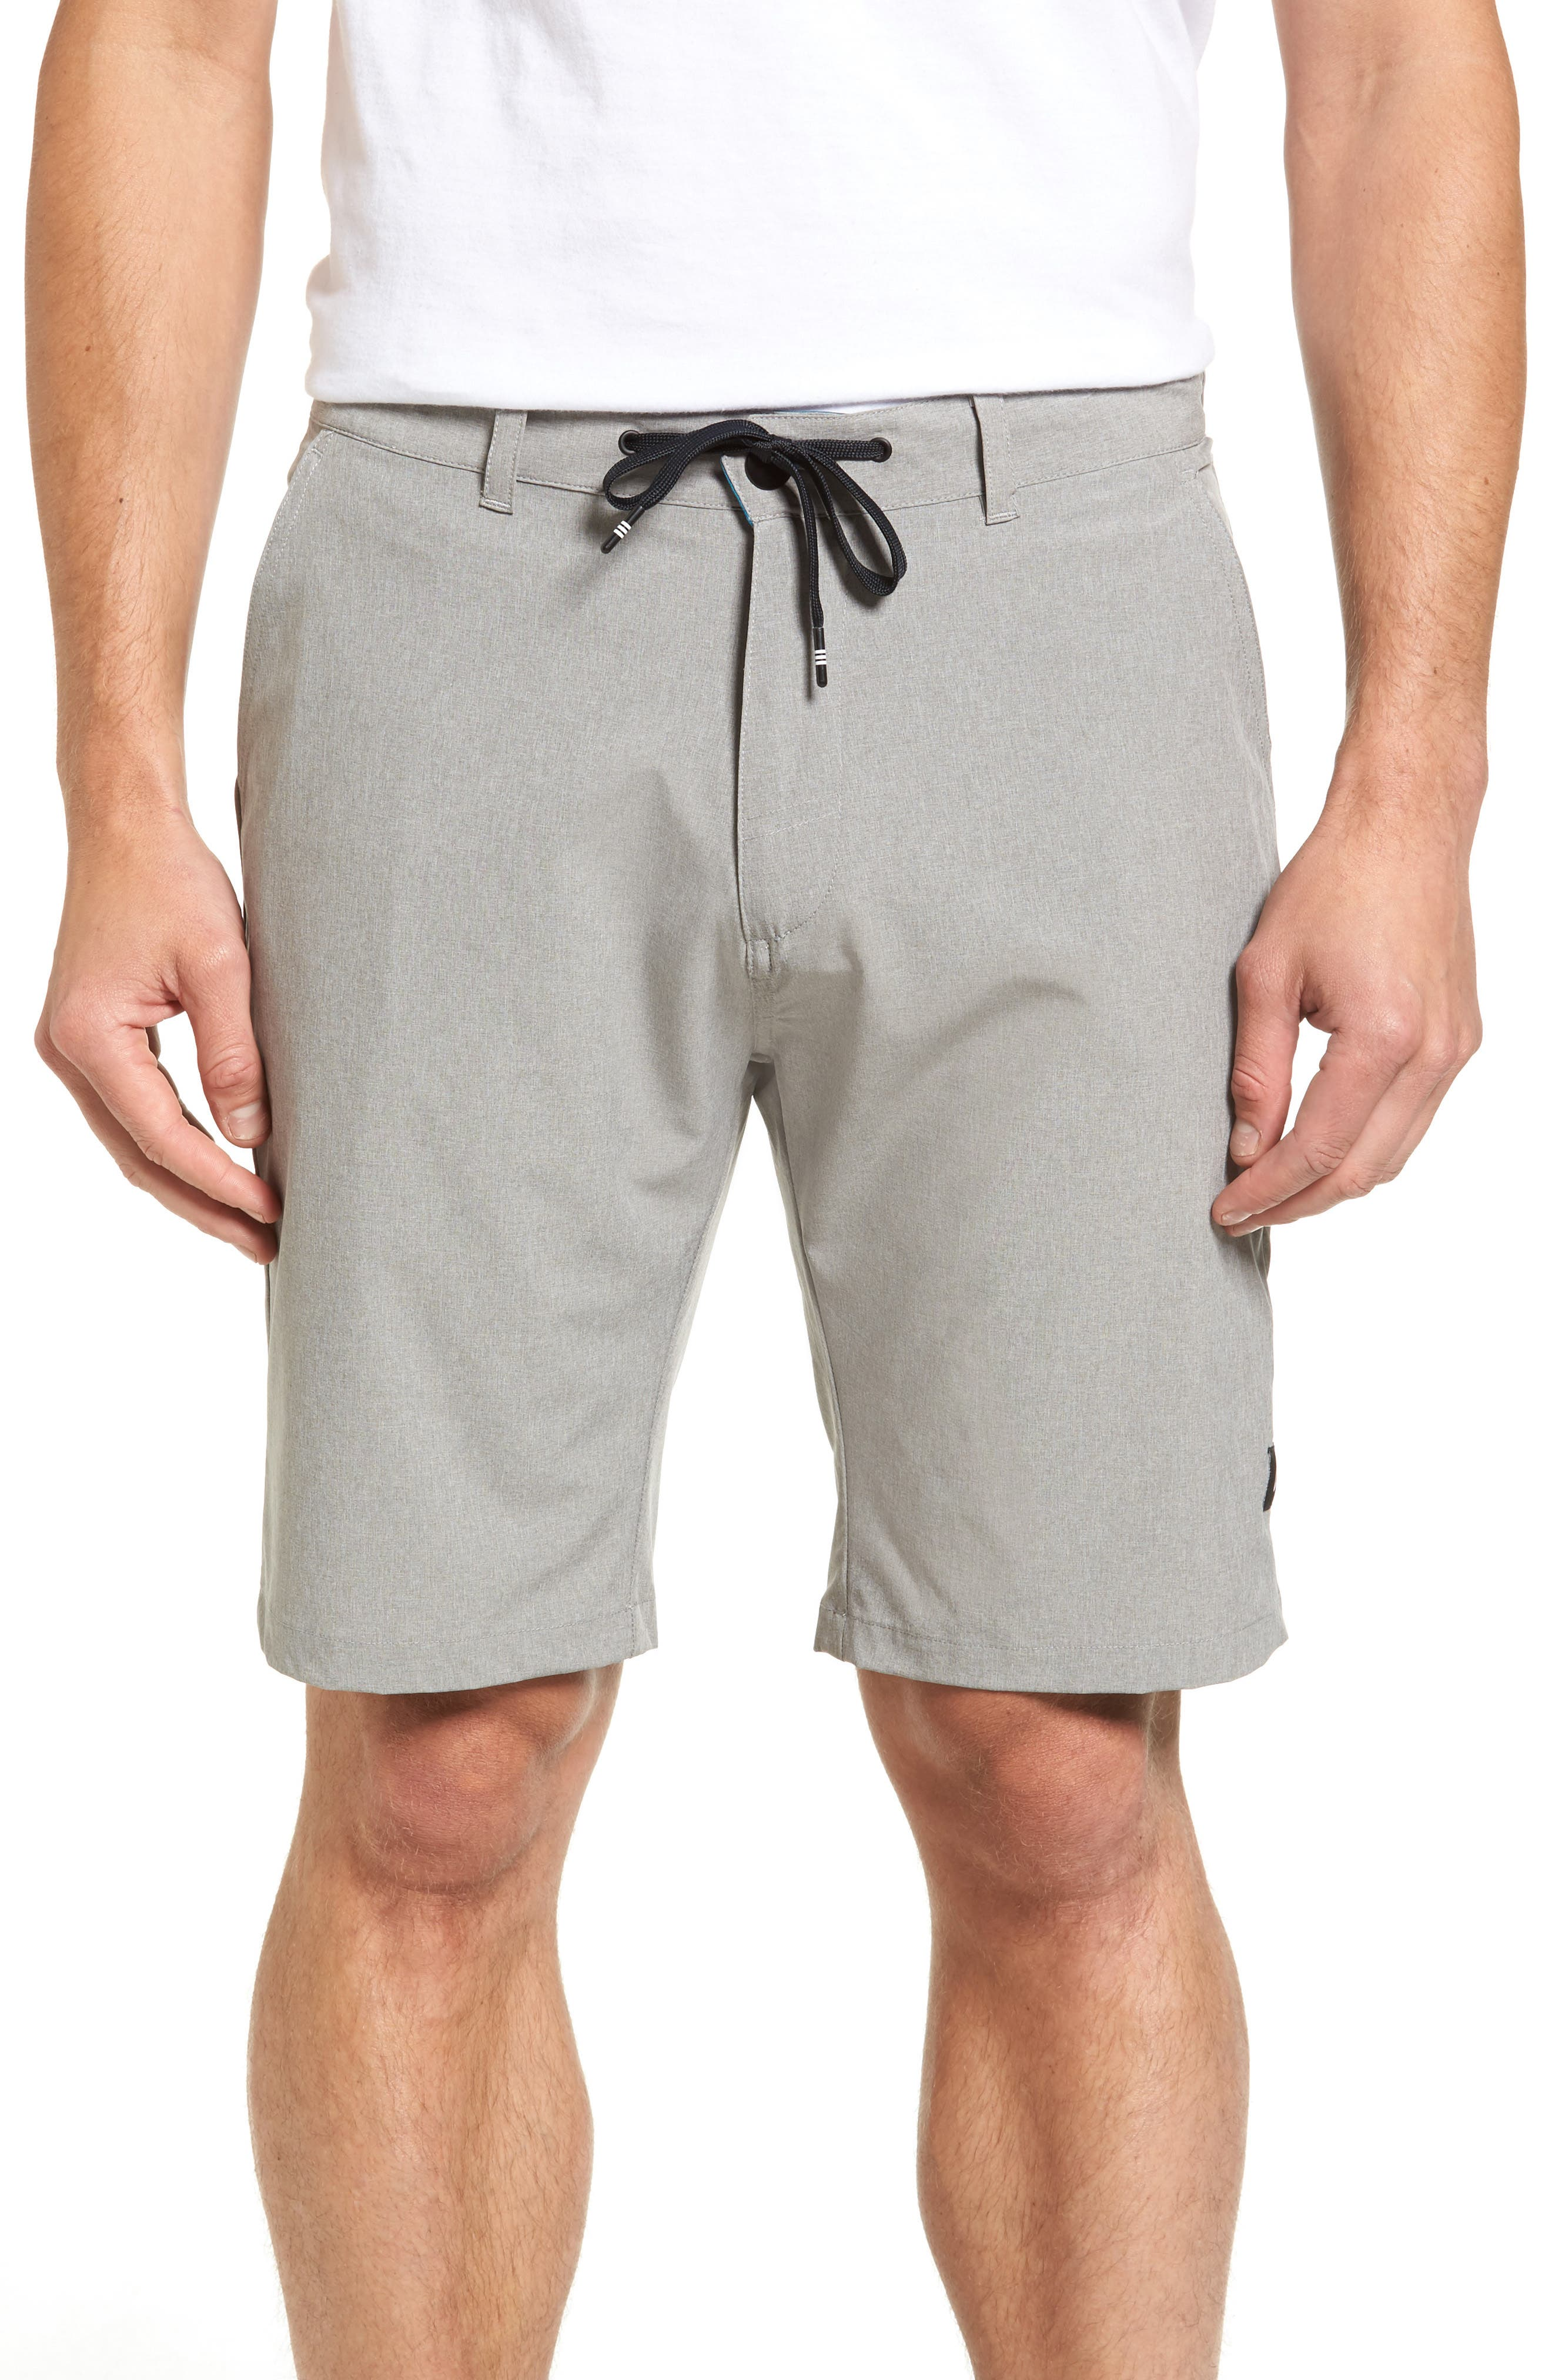 Freedom Carbon Cruiser Shorts,                             Main thumbnail 1, color,                             020